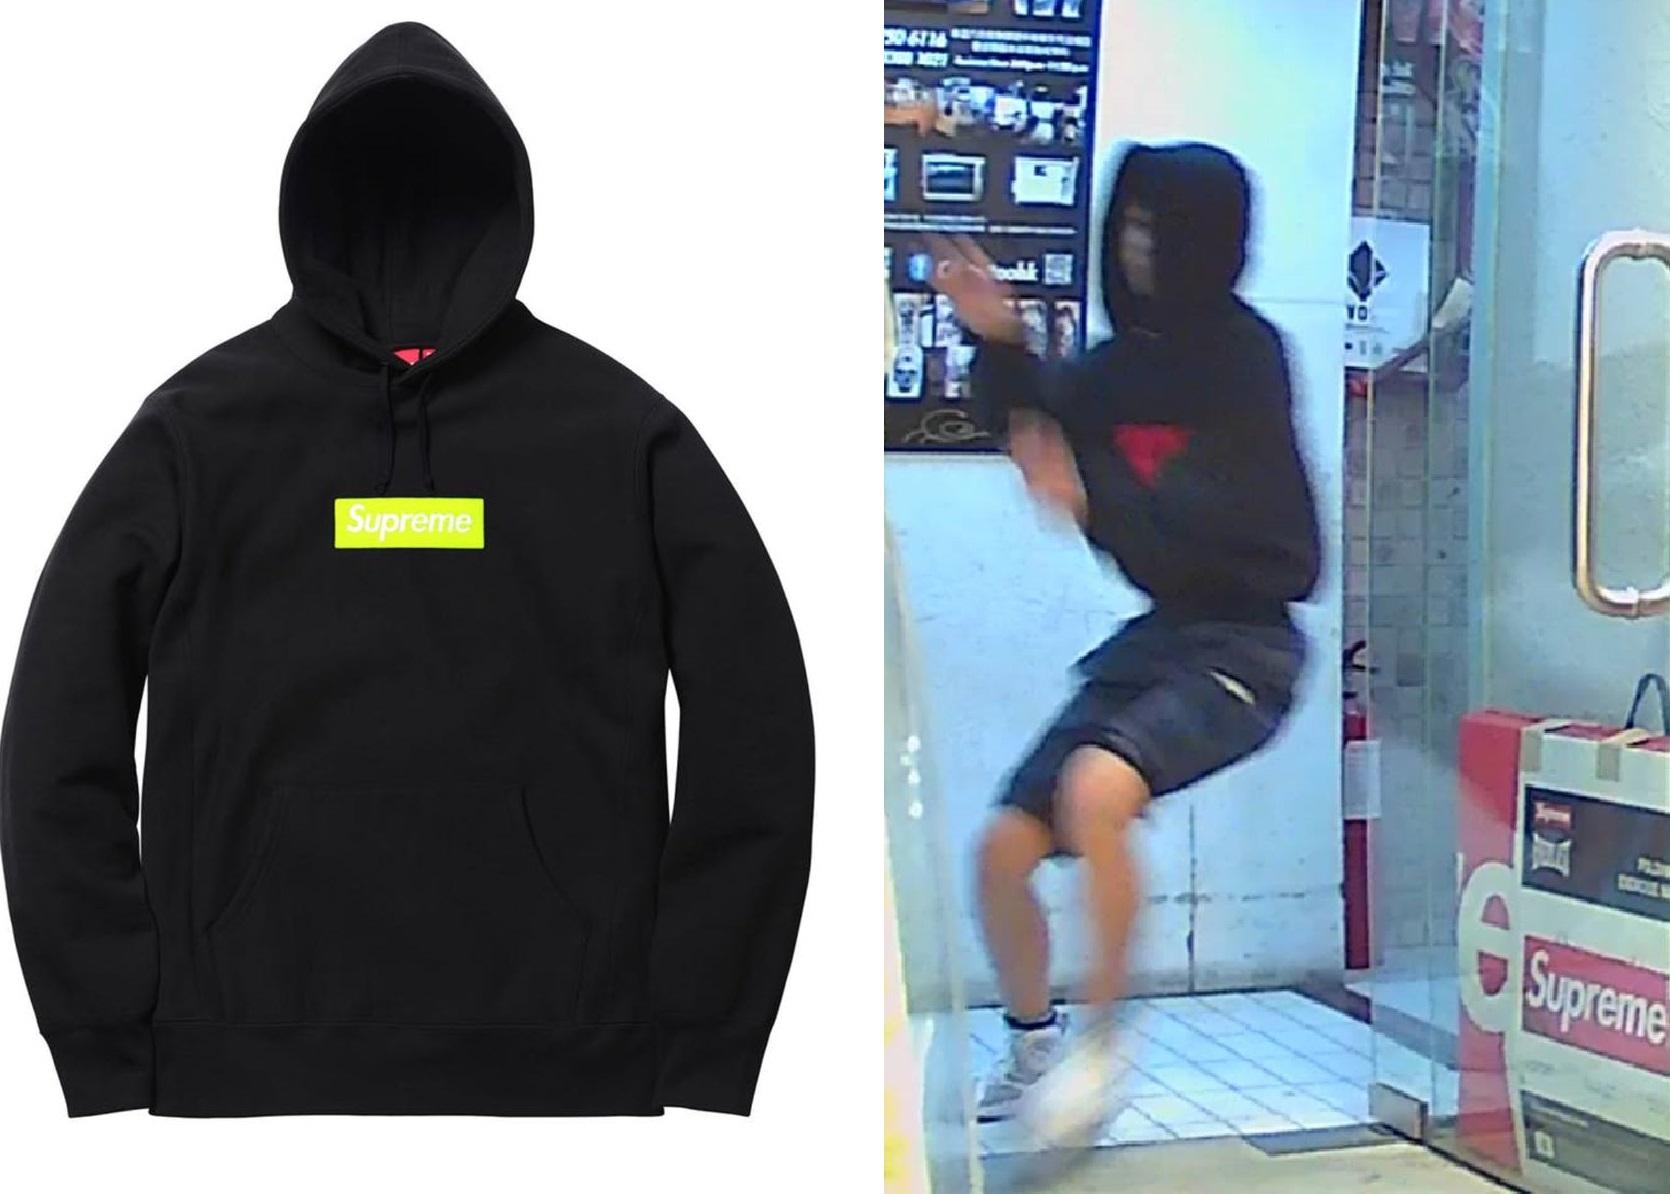 被偷的Supreme Box Logo Hoodie(左)、涉事少年(右)。